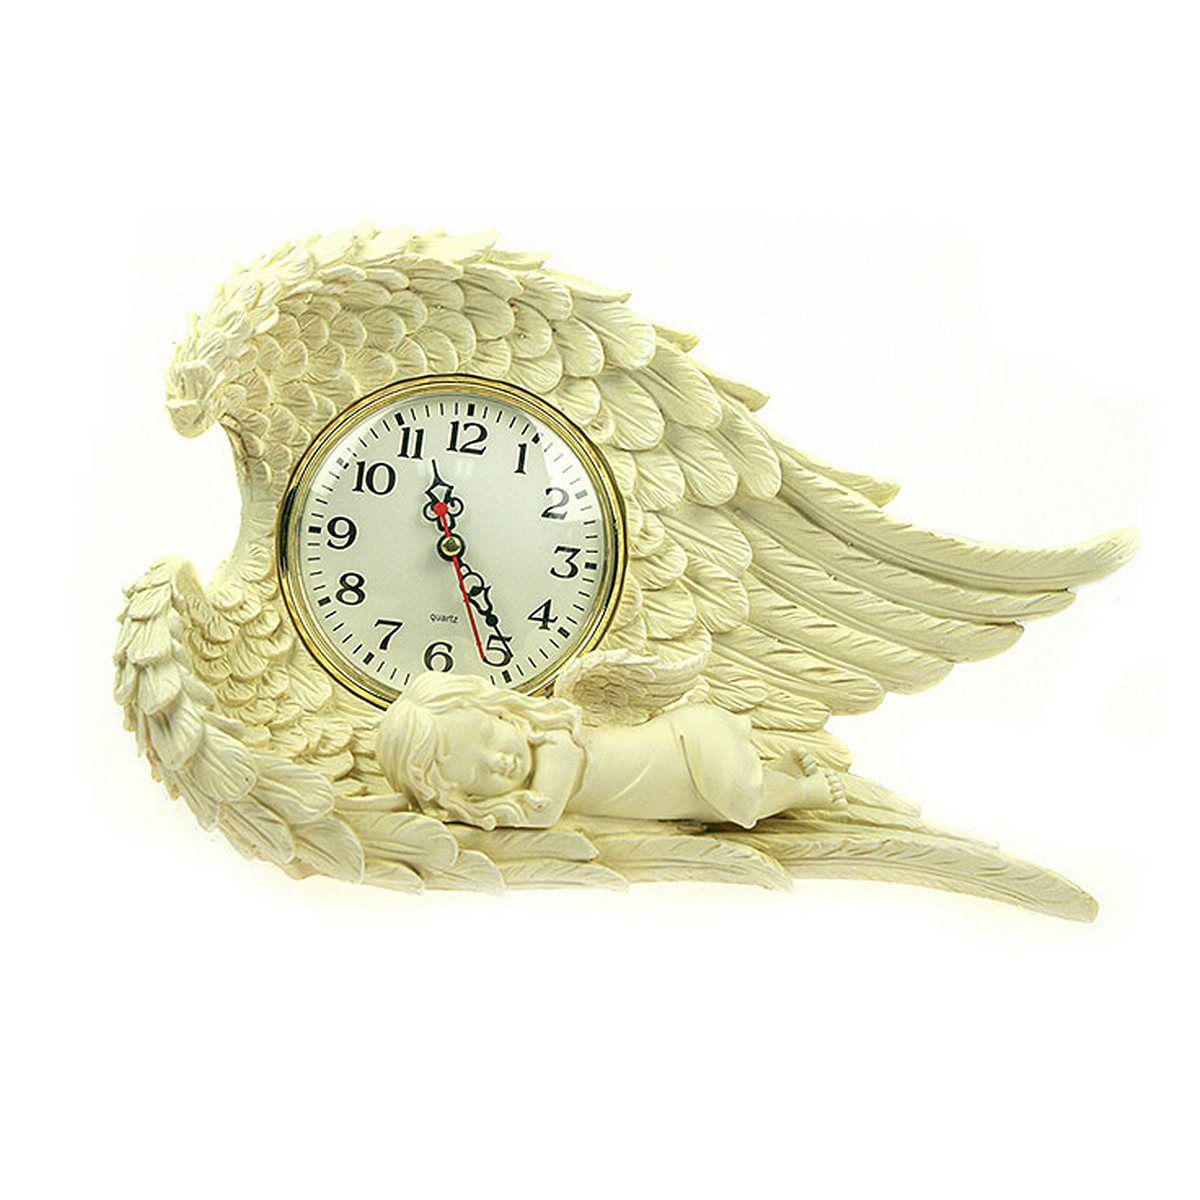 Часы настольные Русские Подарки Ангелочек, 31 х 20 х 10 см. 36417 статуэтка русские подарки мисс рандеву 11 х 10 х 31 см